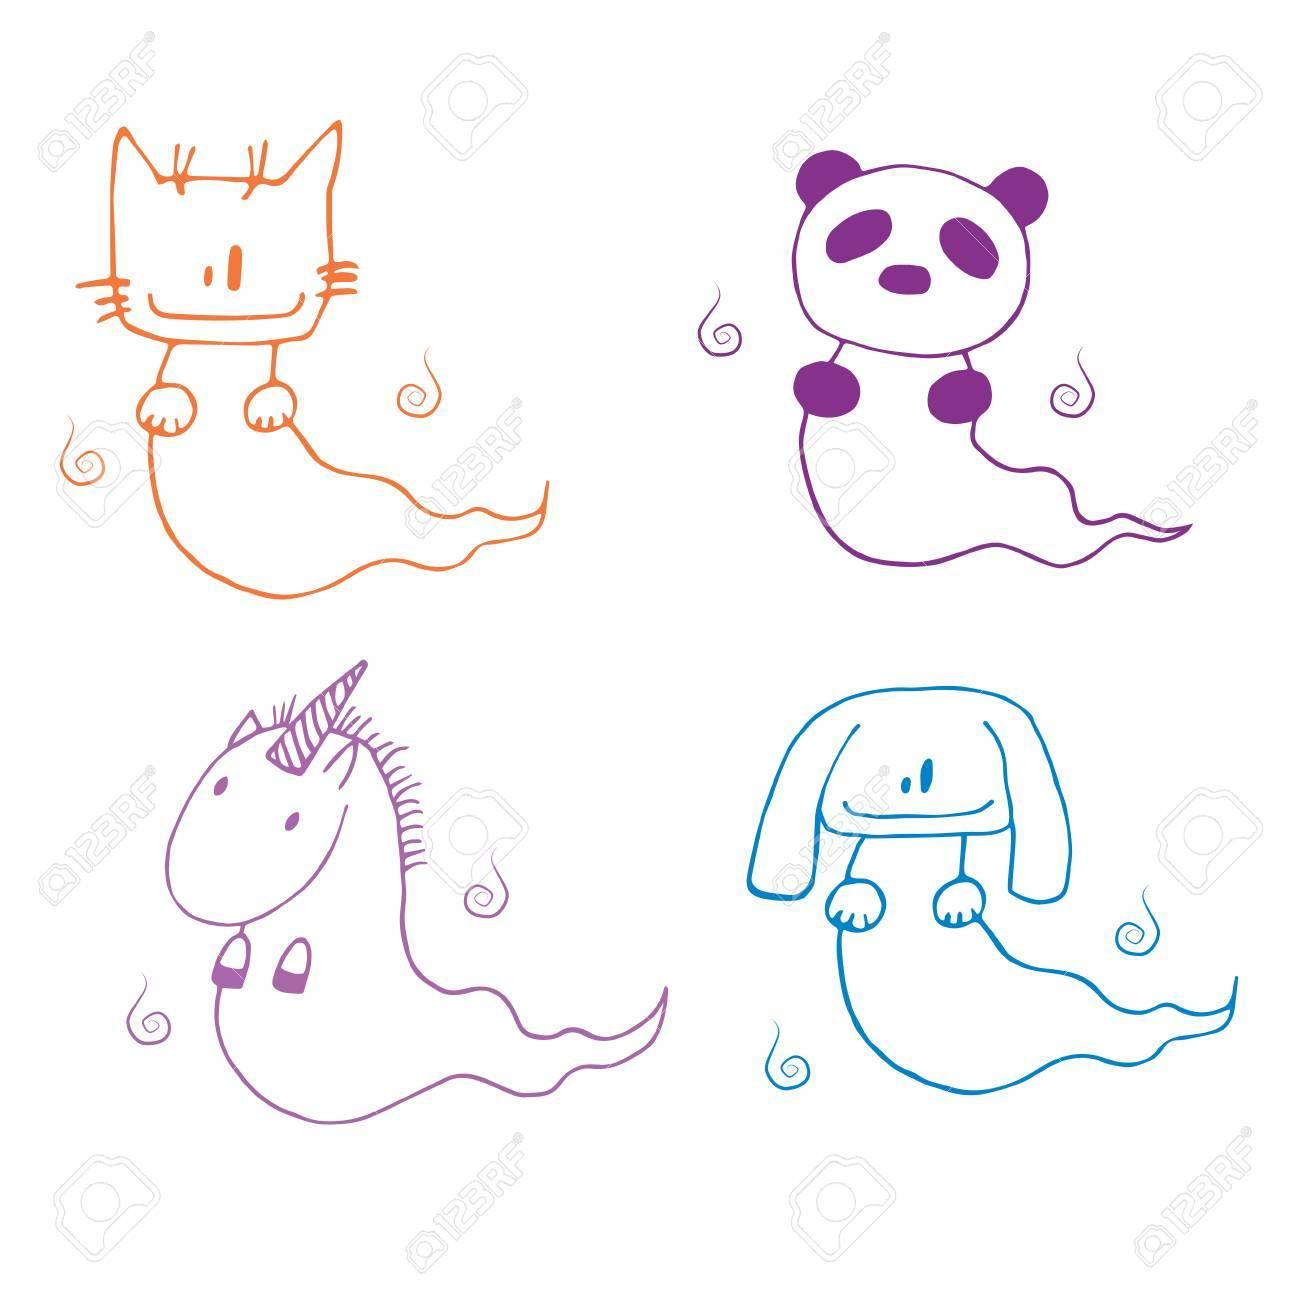 1300x1300 Hand Drawn Illustration Of Cartoon Ghost Animals Cat, Panda